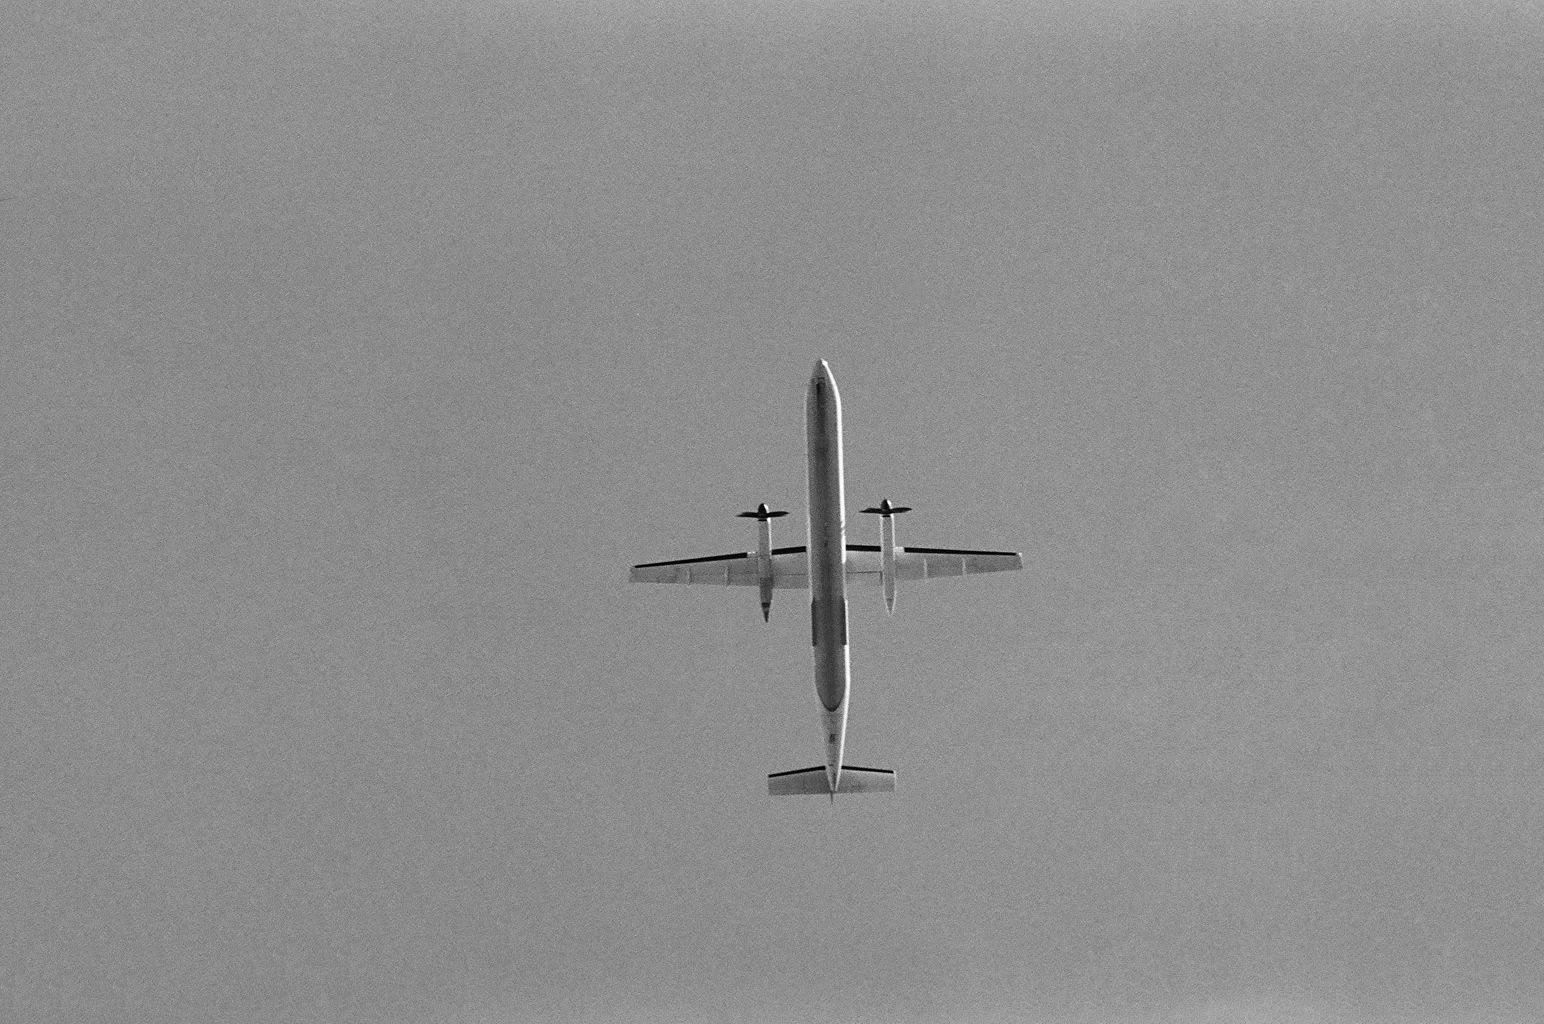 Oceanic Flight 815.jpg